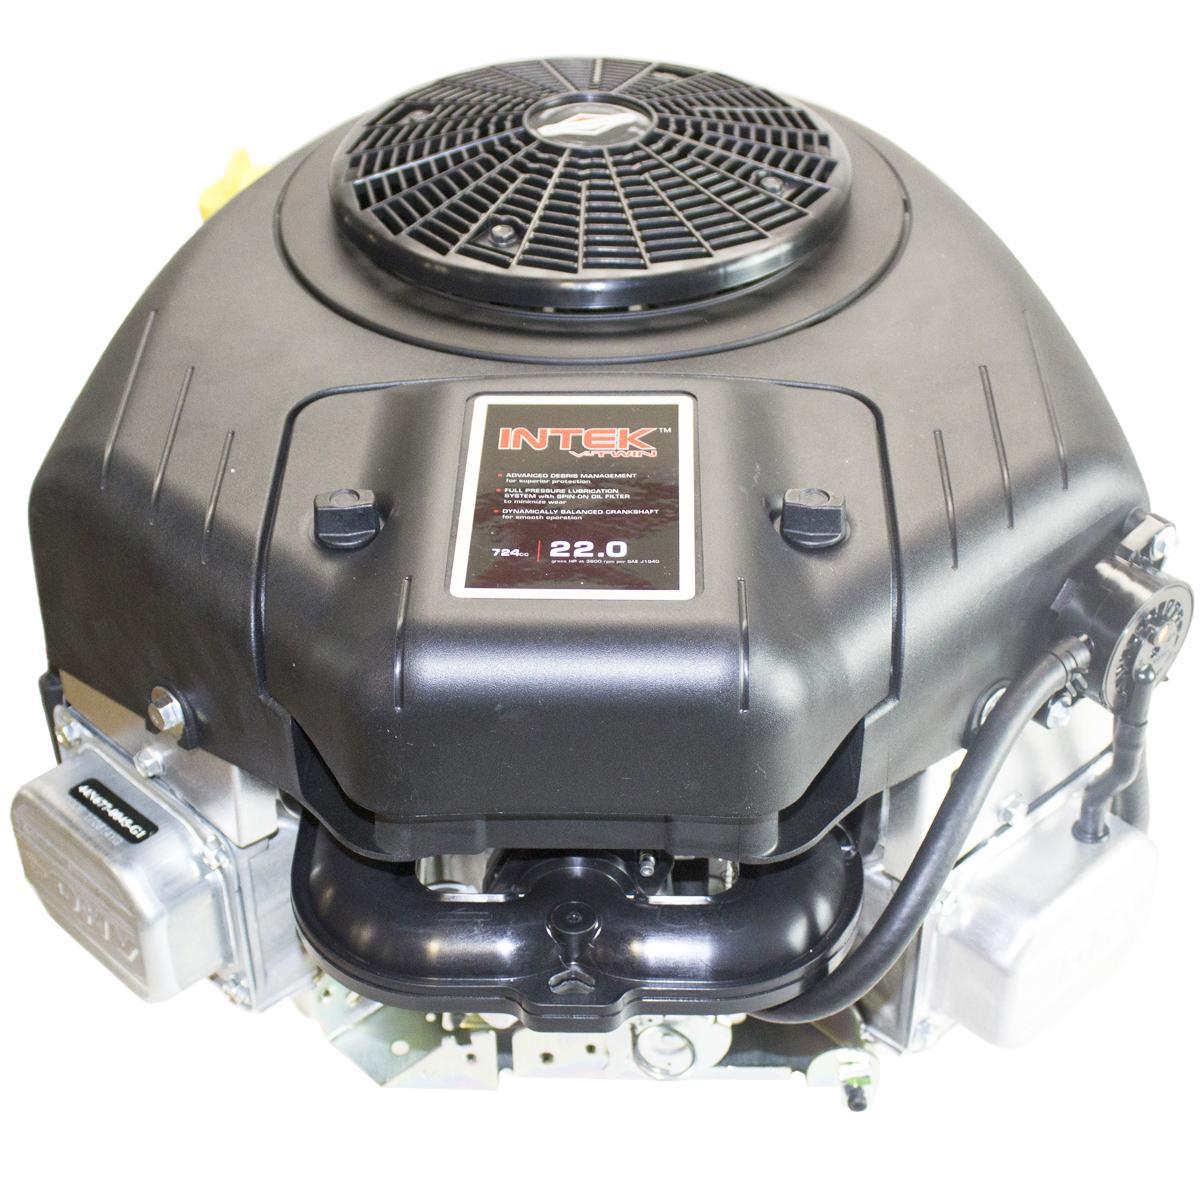 "22hp Briggs & Stratton Intek Engine, Vertical 1""x3-5/32"" Keyed Shaft, Fuel Pump, 9 Amp Alternator, Electric Start, Choke-a-matic"